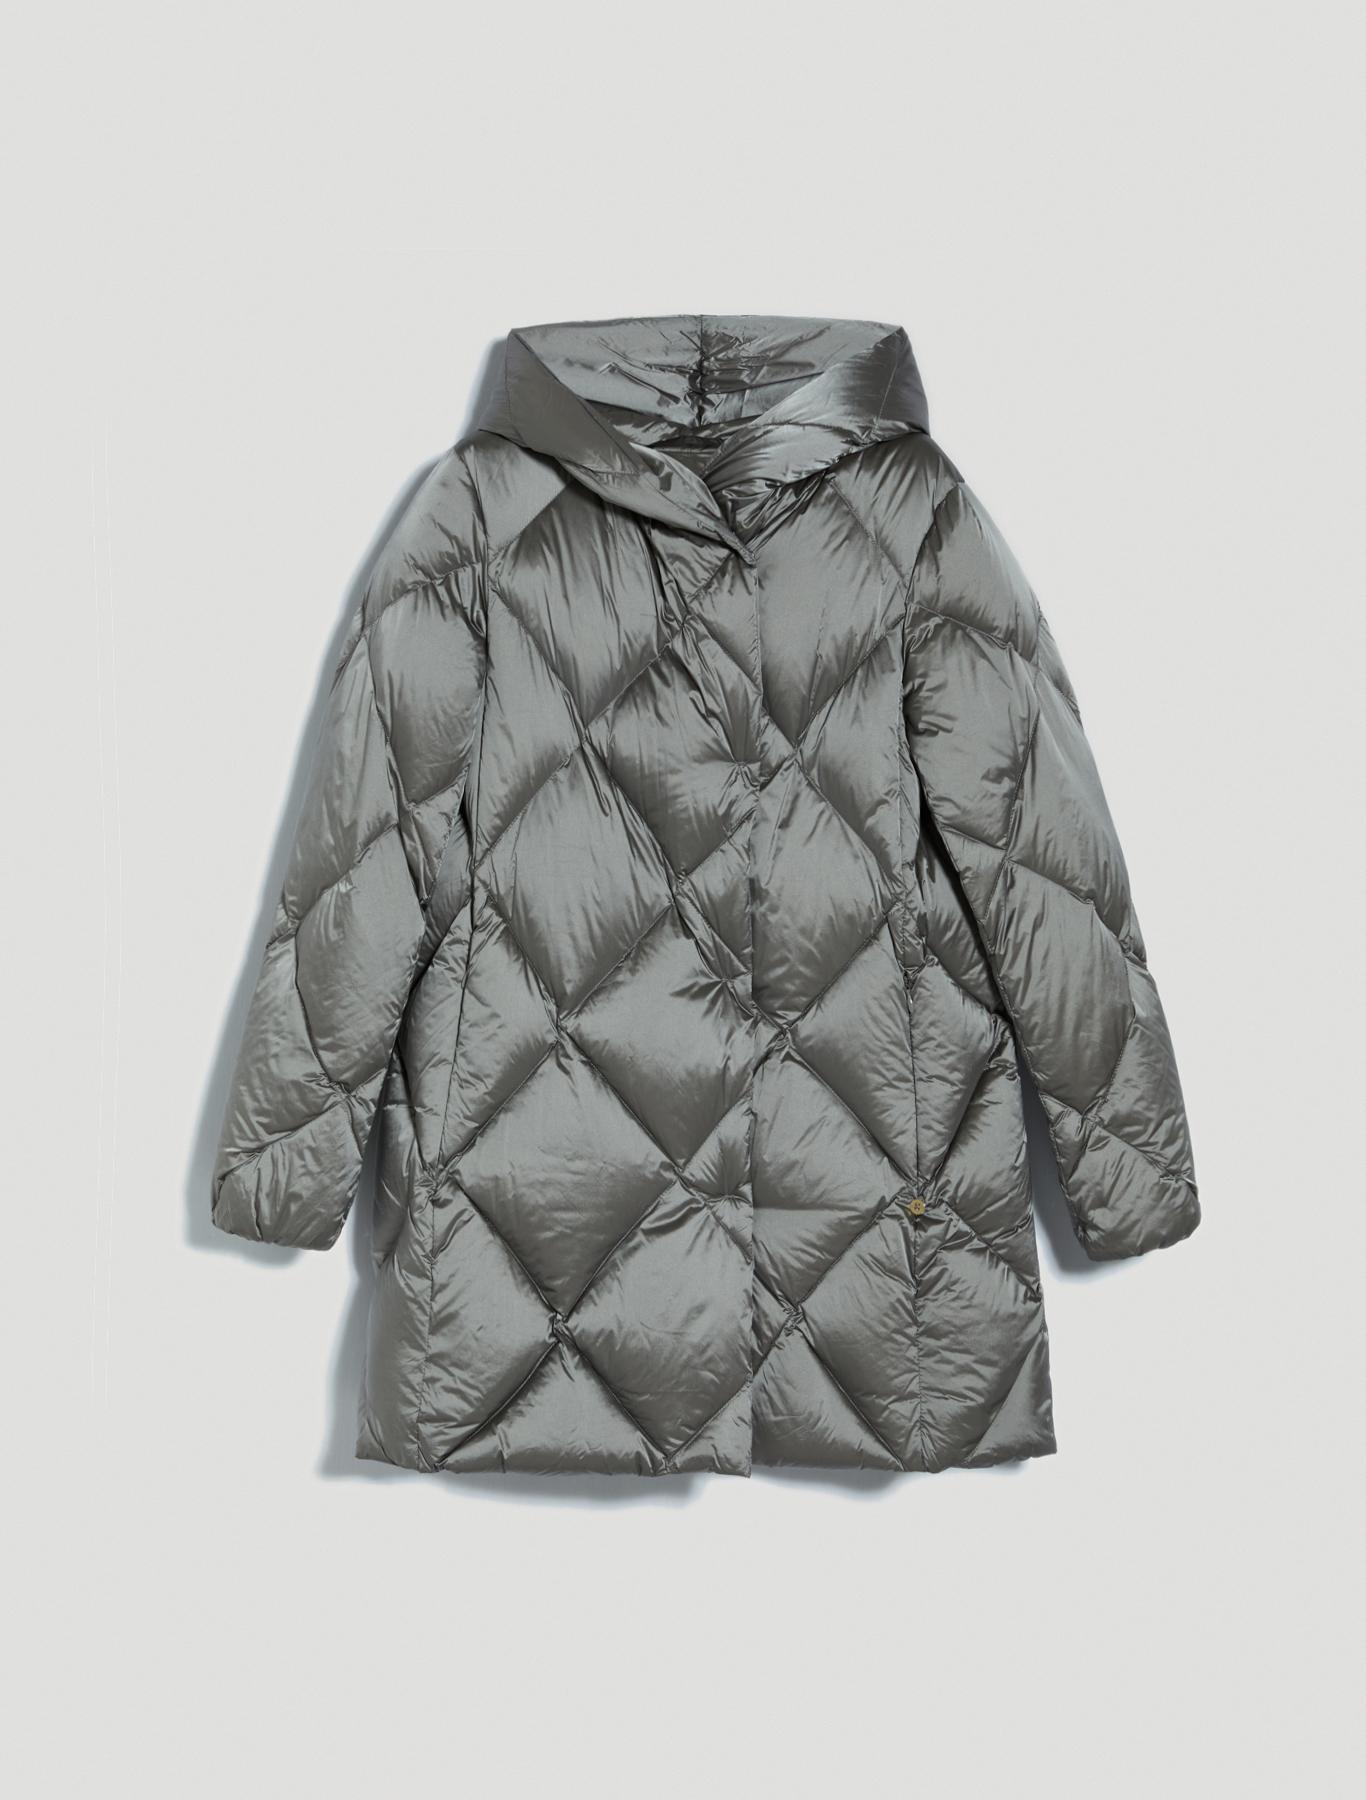 Iridescent nylon down jacket - pearl grey - pennyblack